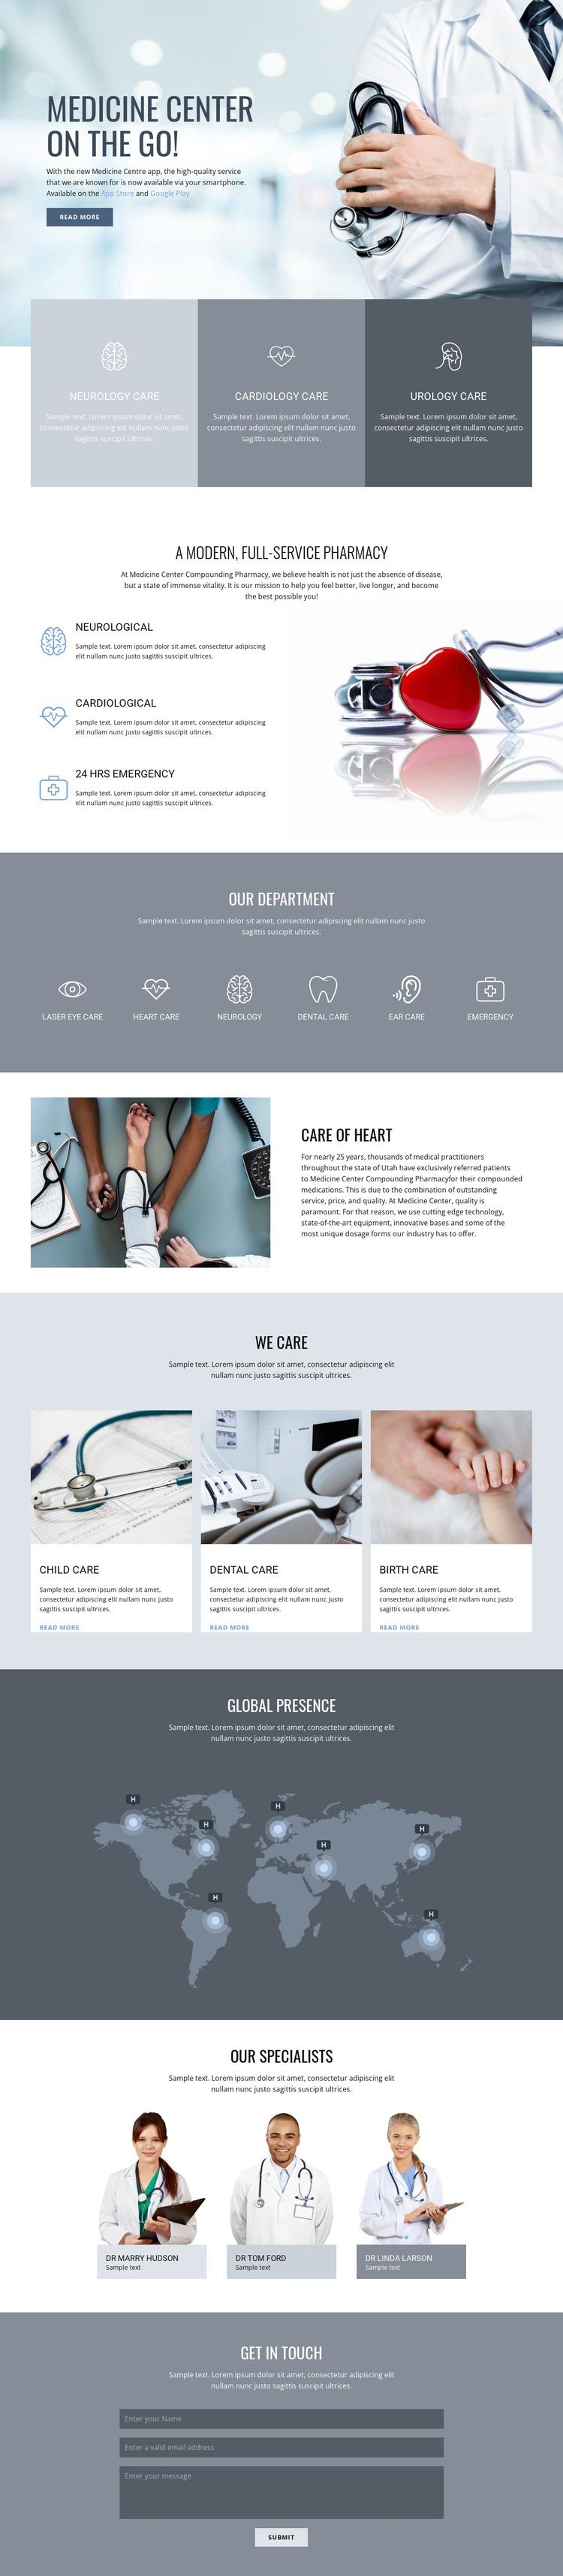 Pharmacy and medicine Joomla Template